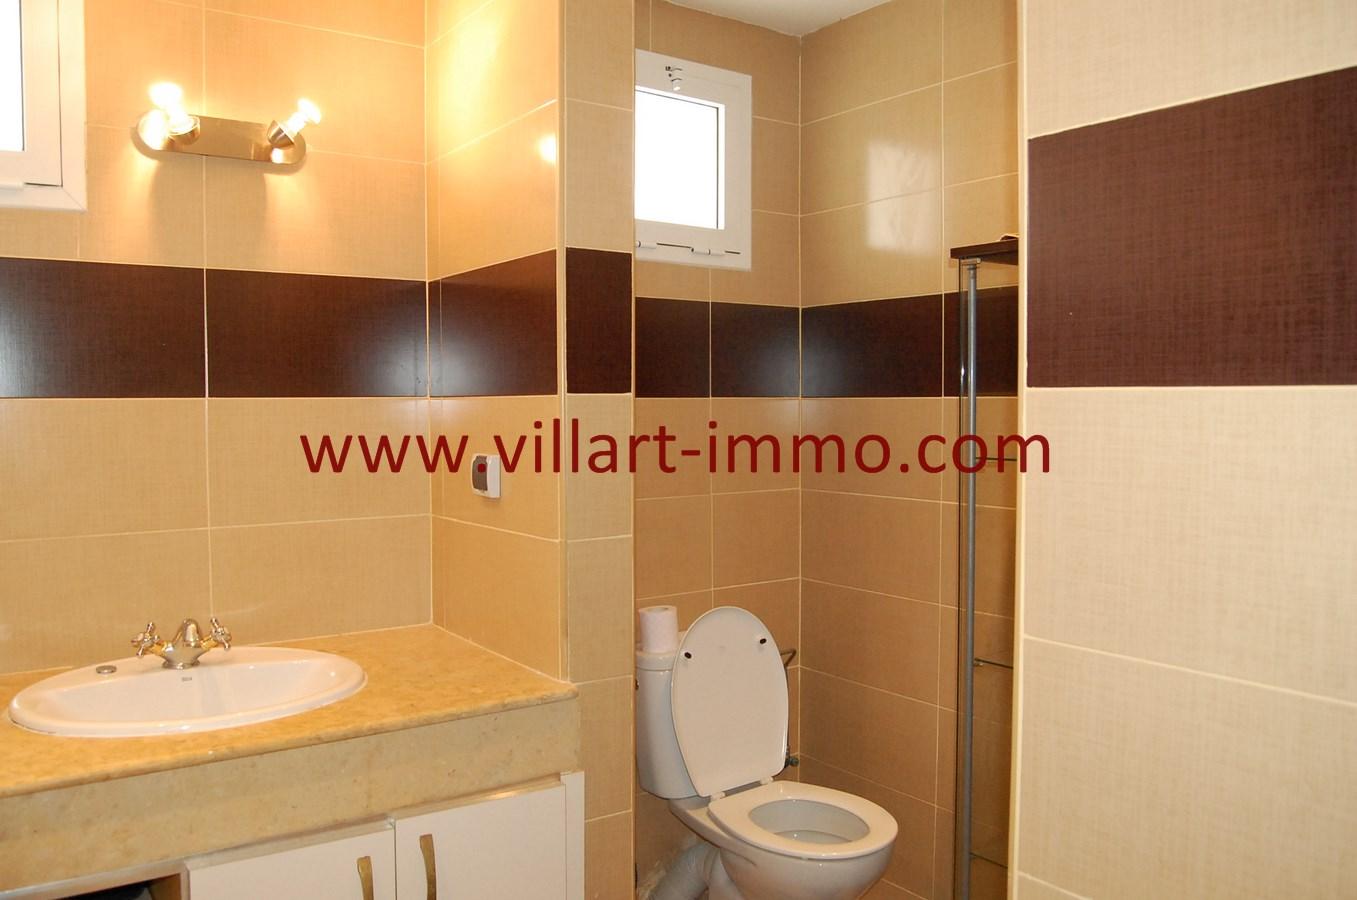 8-Vente-Appartement-Tanger-Salle de Bain 1-VA480-Villart Immo